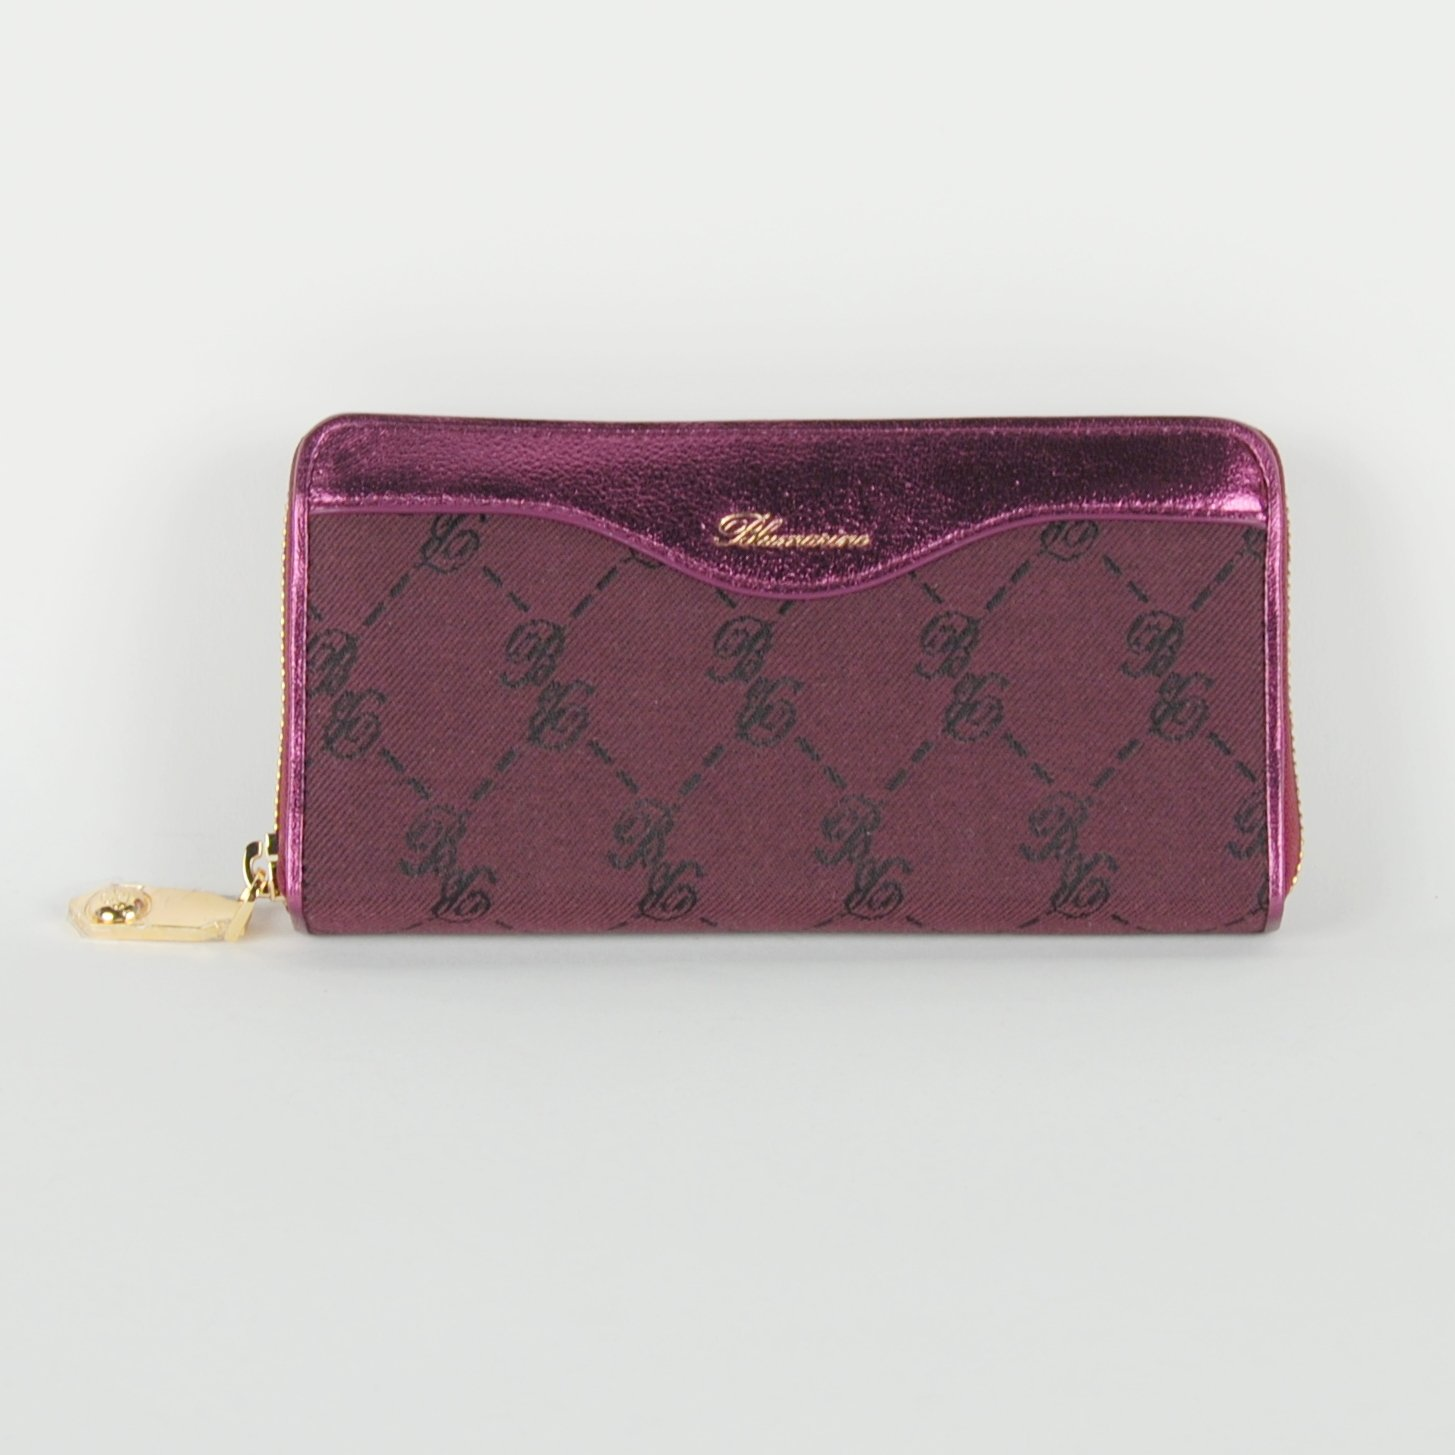 Blumarine Women's Wallet BL1432682